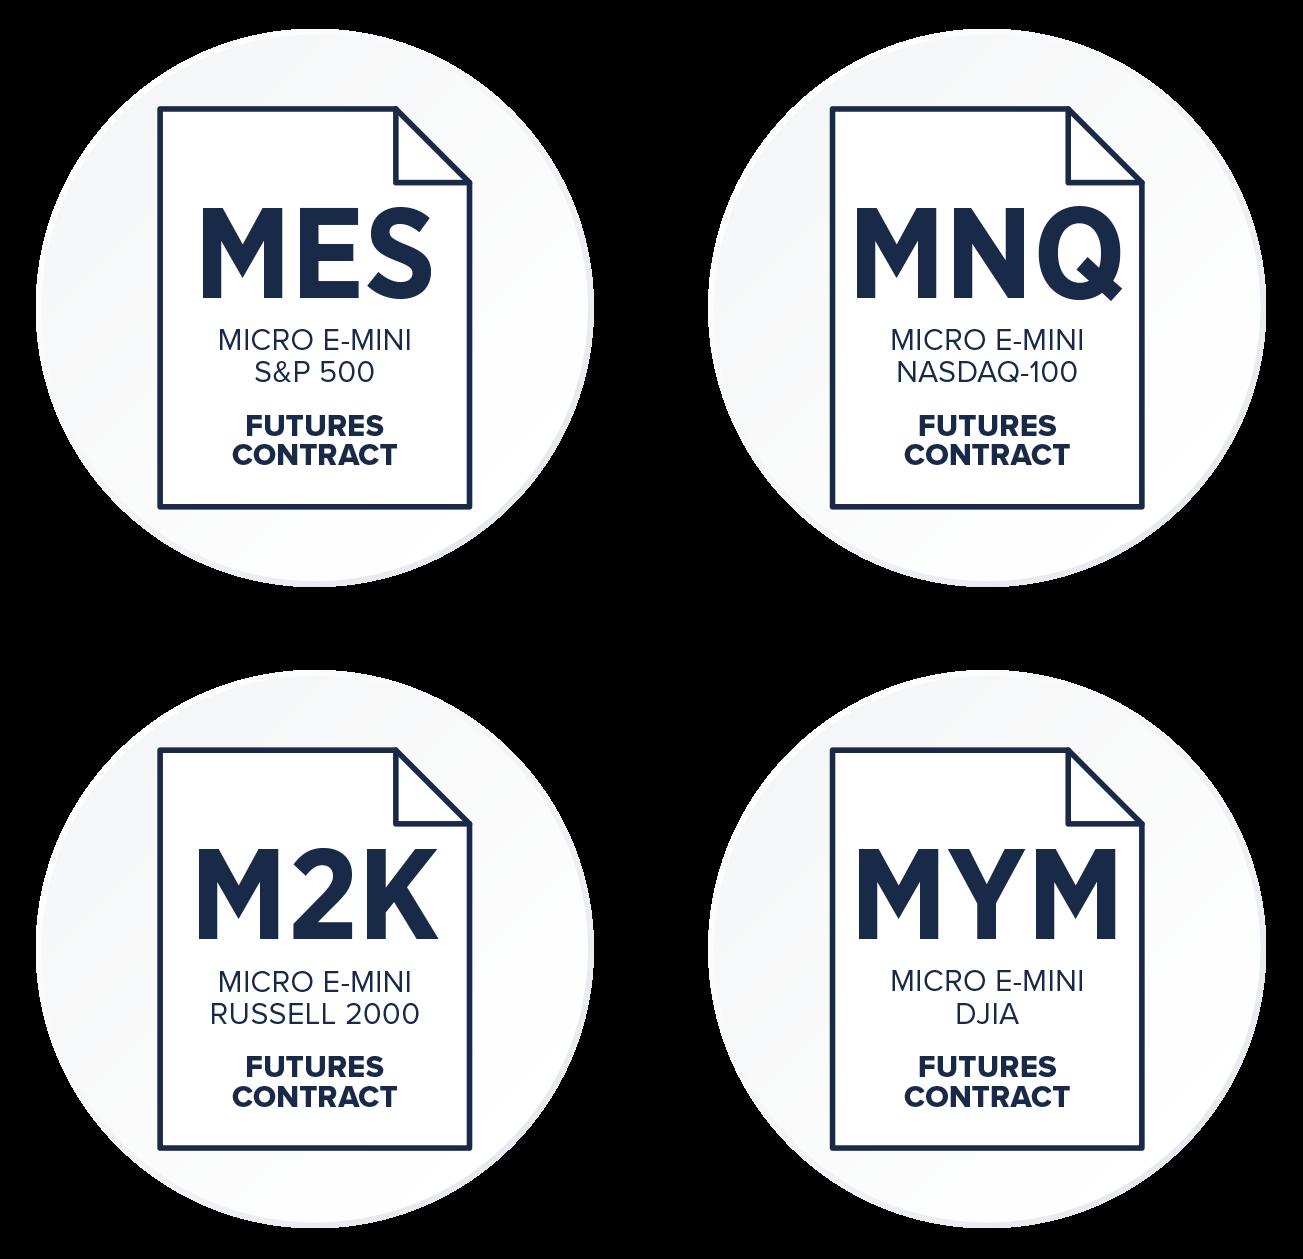 Micro E-mini Futures